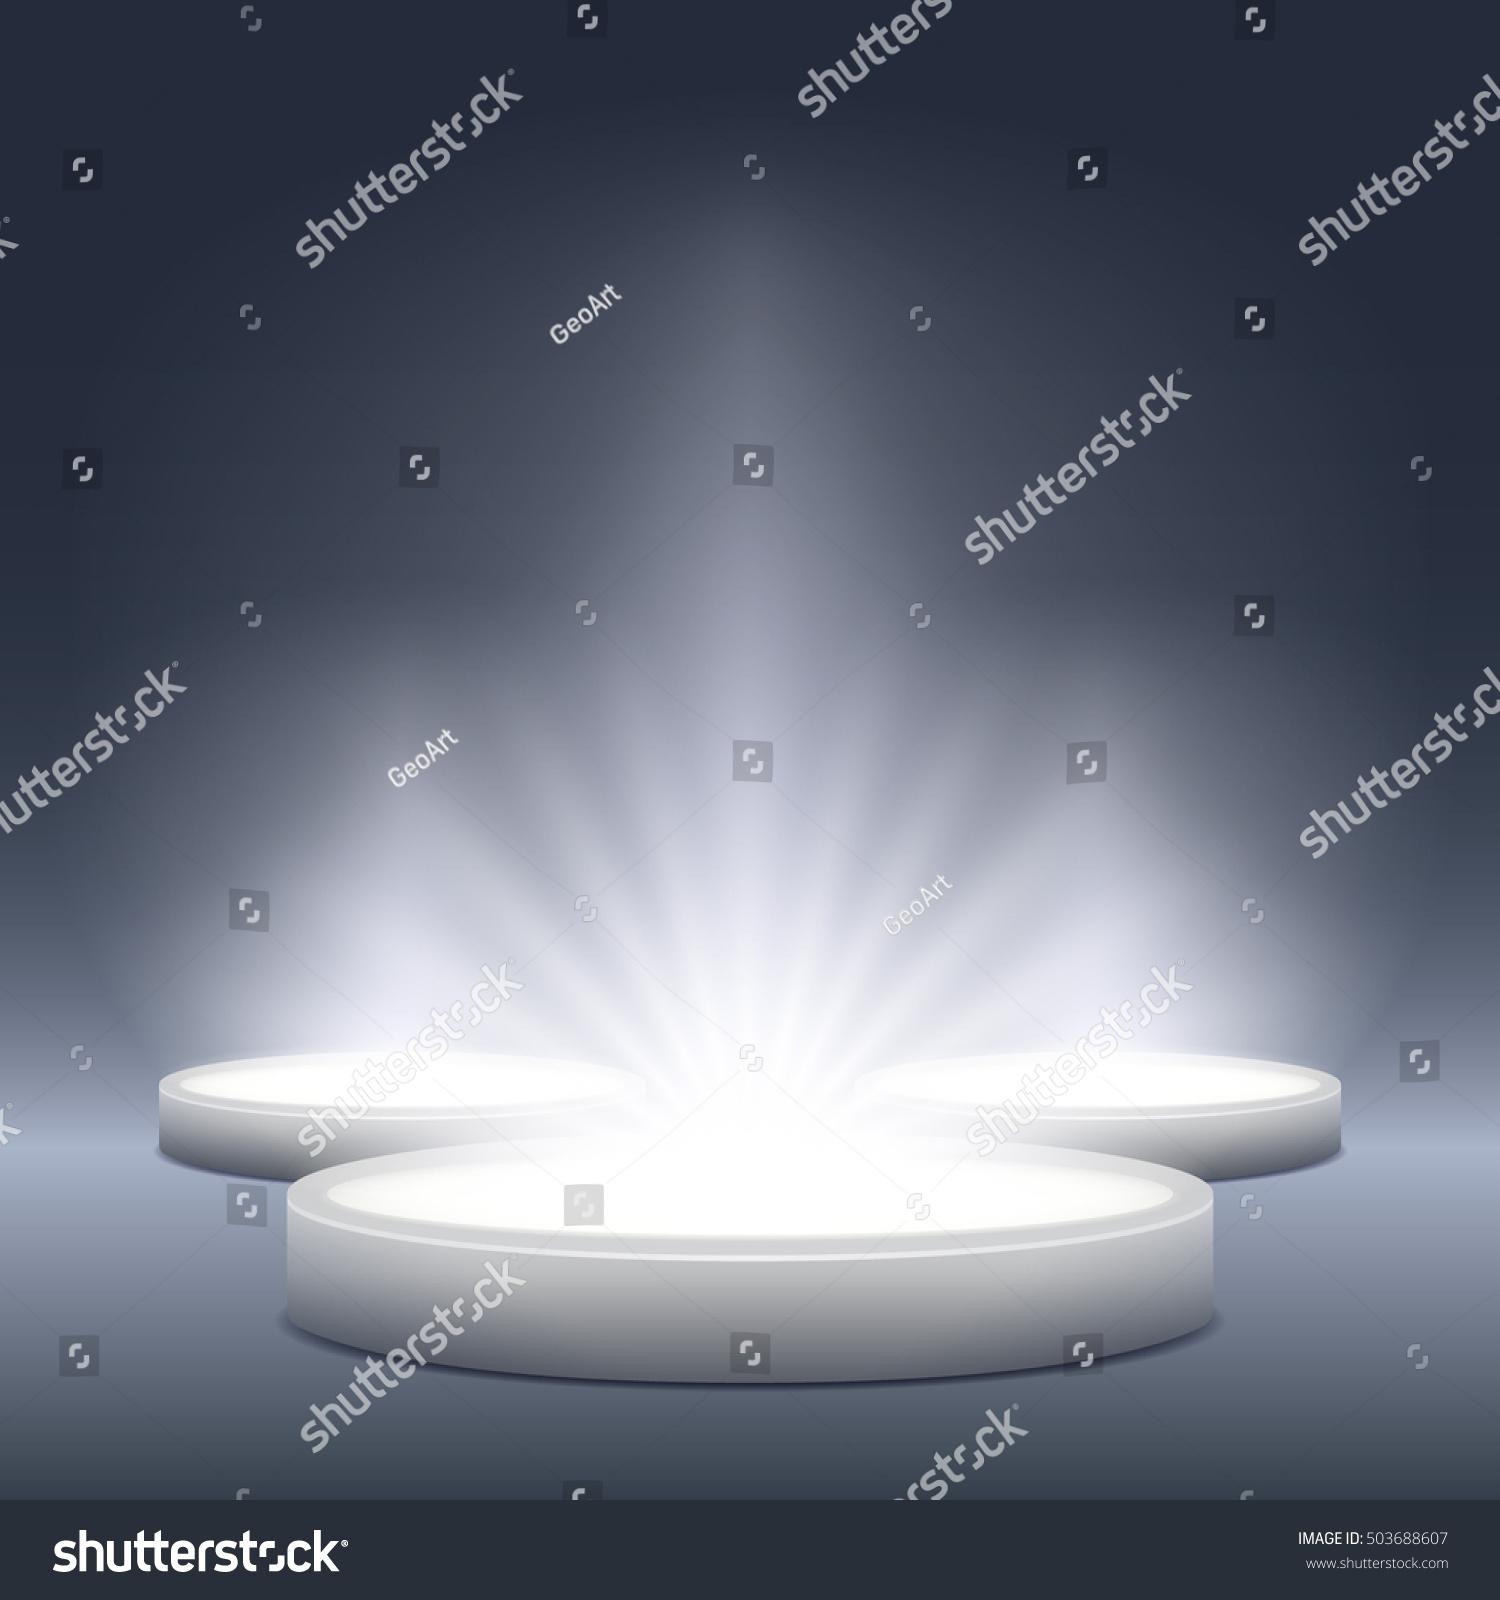 White Studio Background With Podium: Illuminated Light Festive Stage Podium Scene Stock Vector